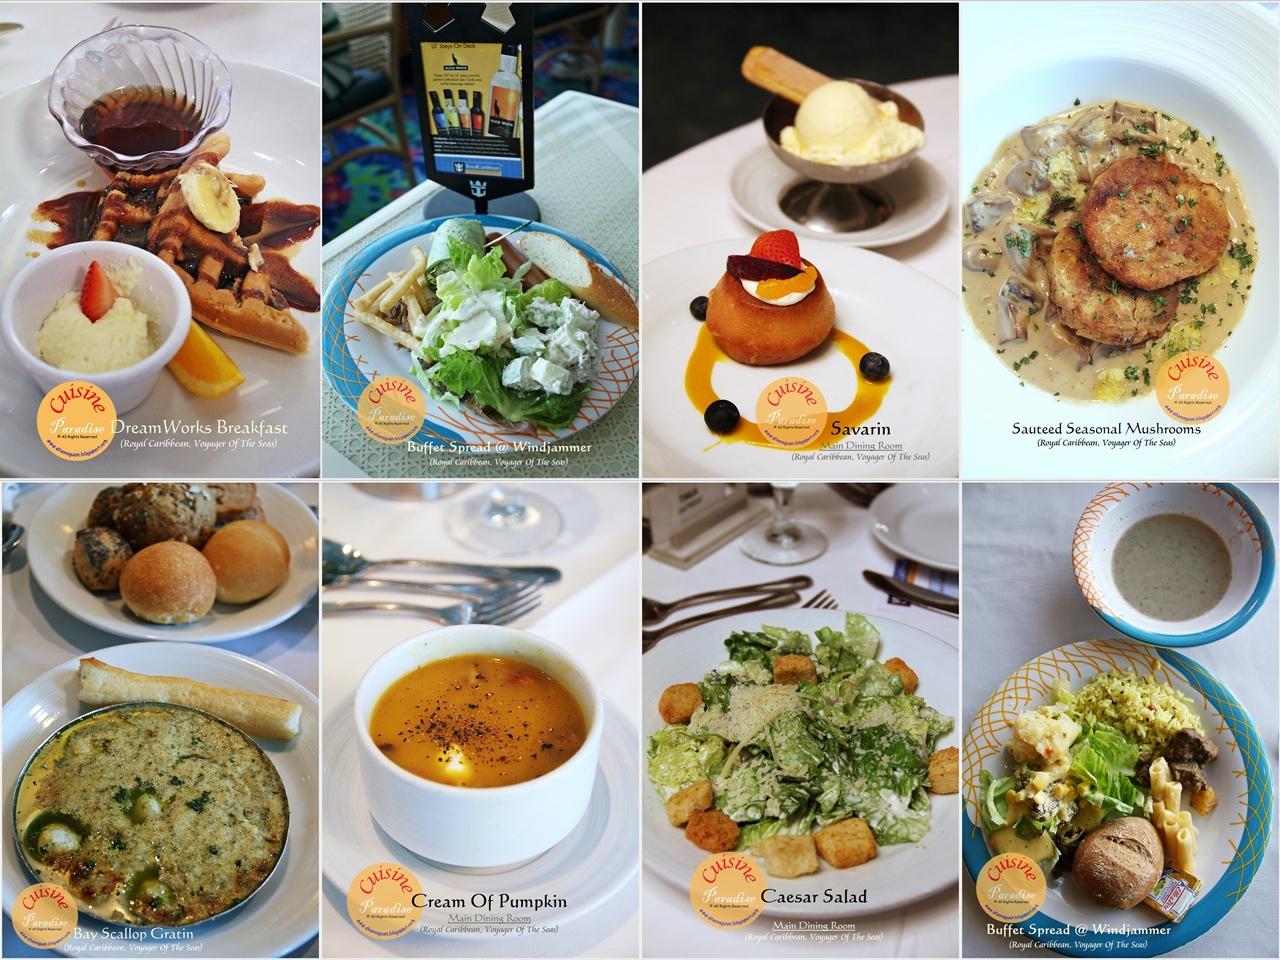 Cuisine Paradise Singapore Food Blog Recipes Reviews And Travel Royal Caribbean